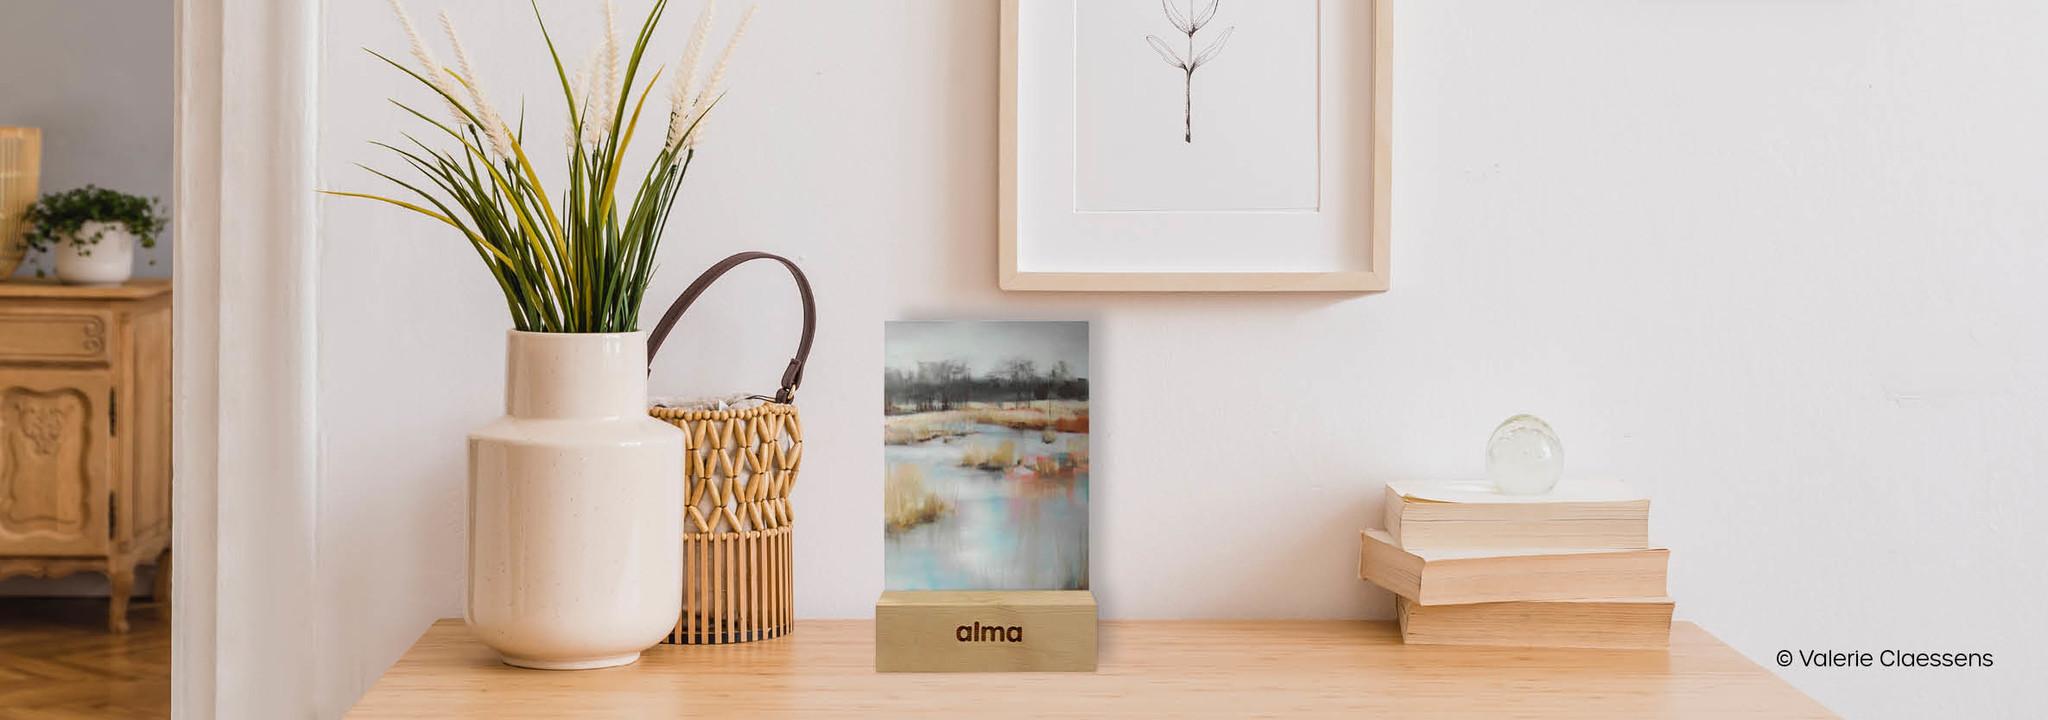 Alma bij jouw thuis